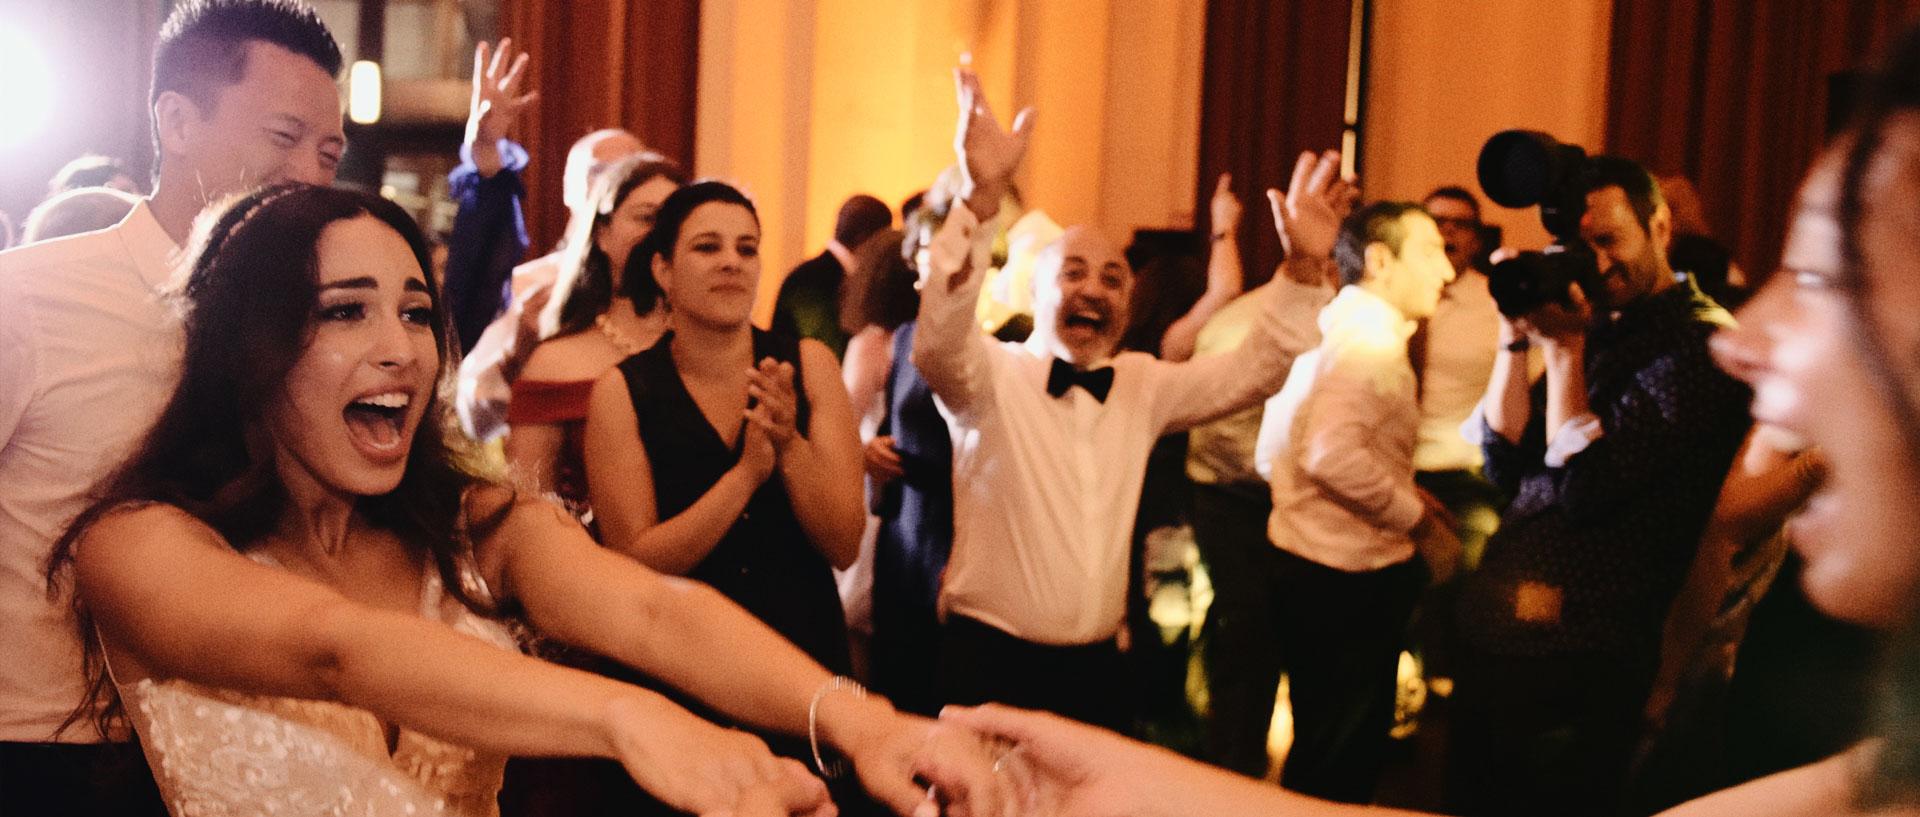 Natasha & Jad Wedding - Casino Biarritz (41).jpg